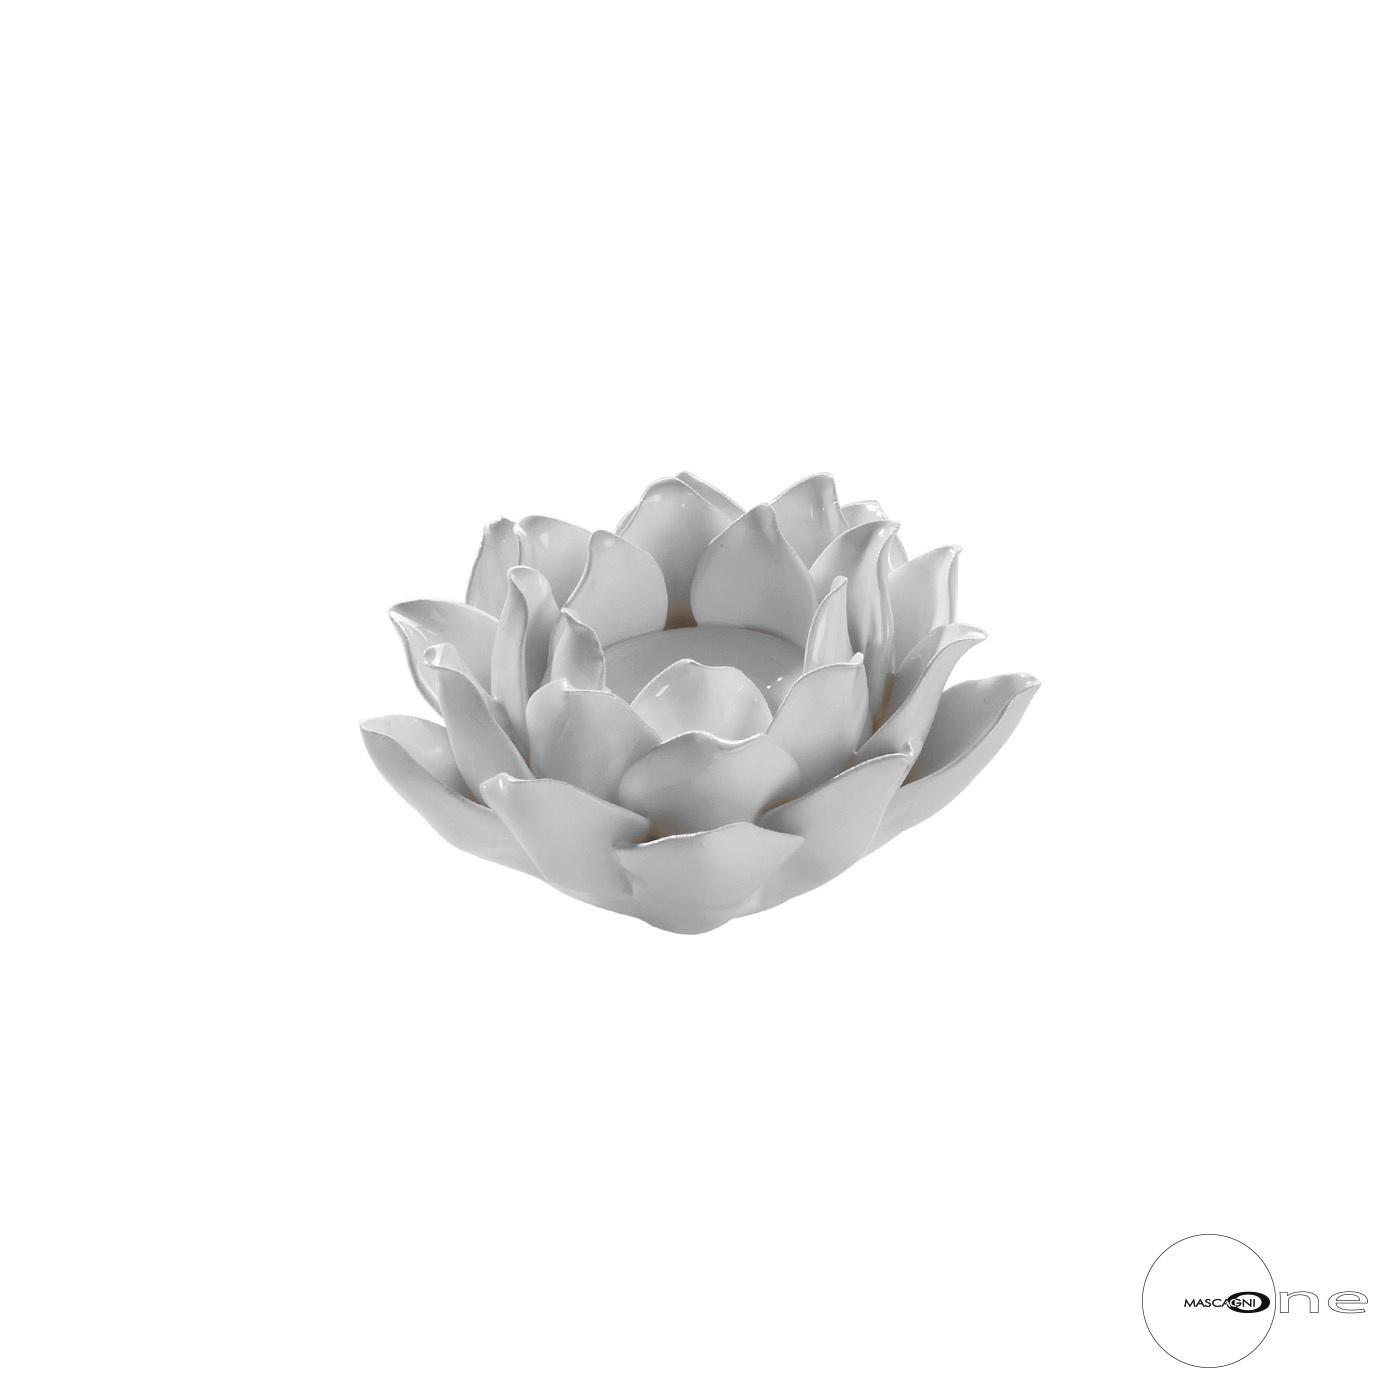 Art Mascagni O1501 CANDLE HOLDER 10,8X5 - COL.WHITE